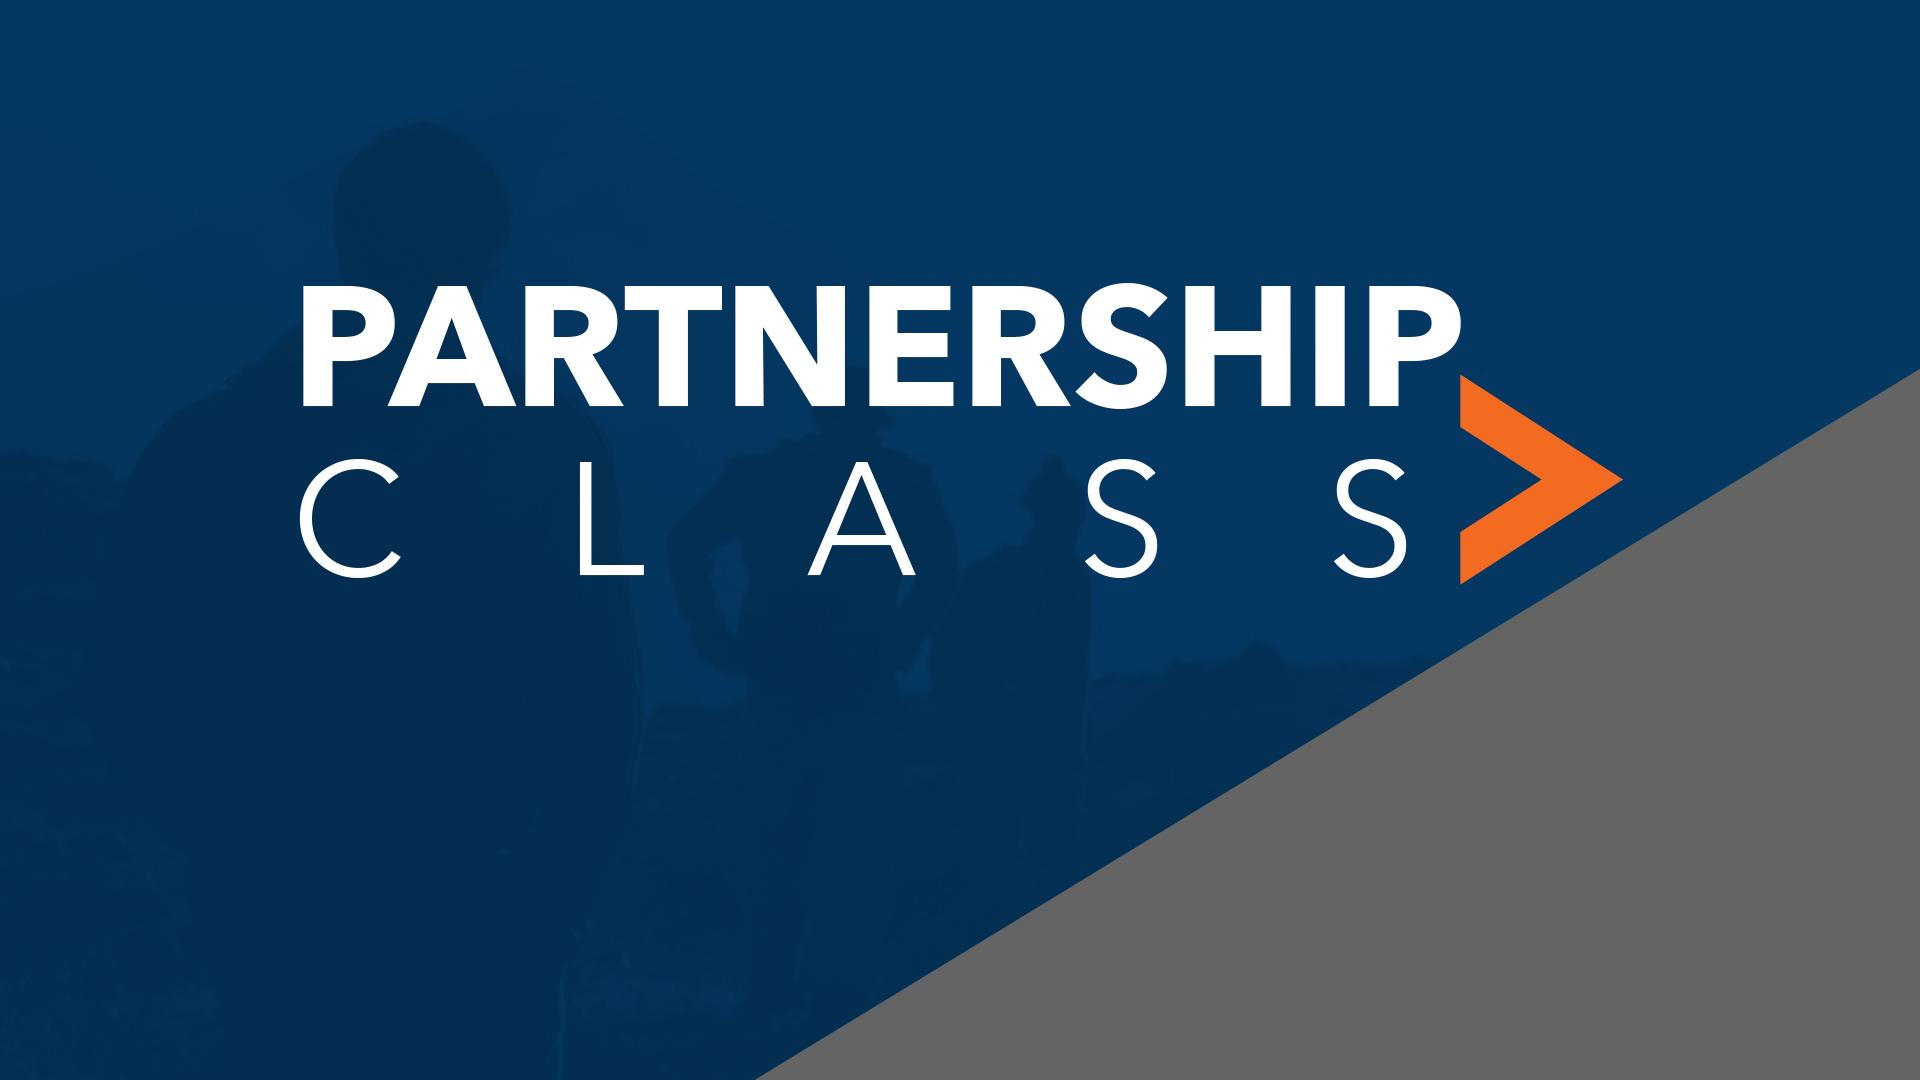 Partnership class title